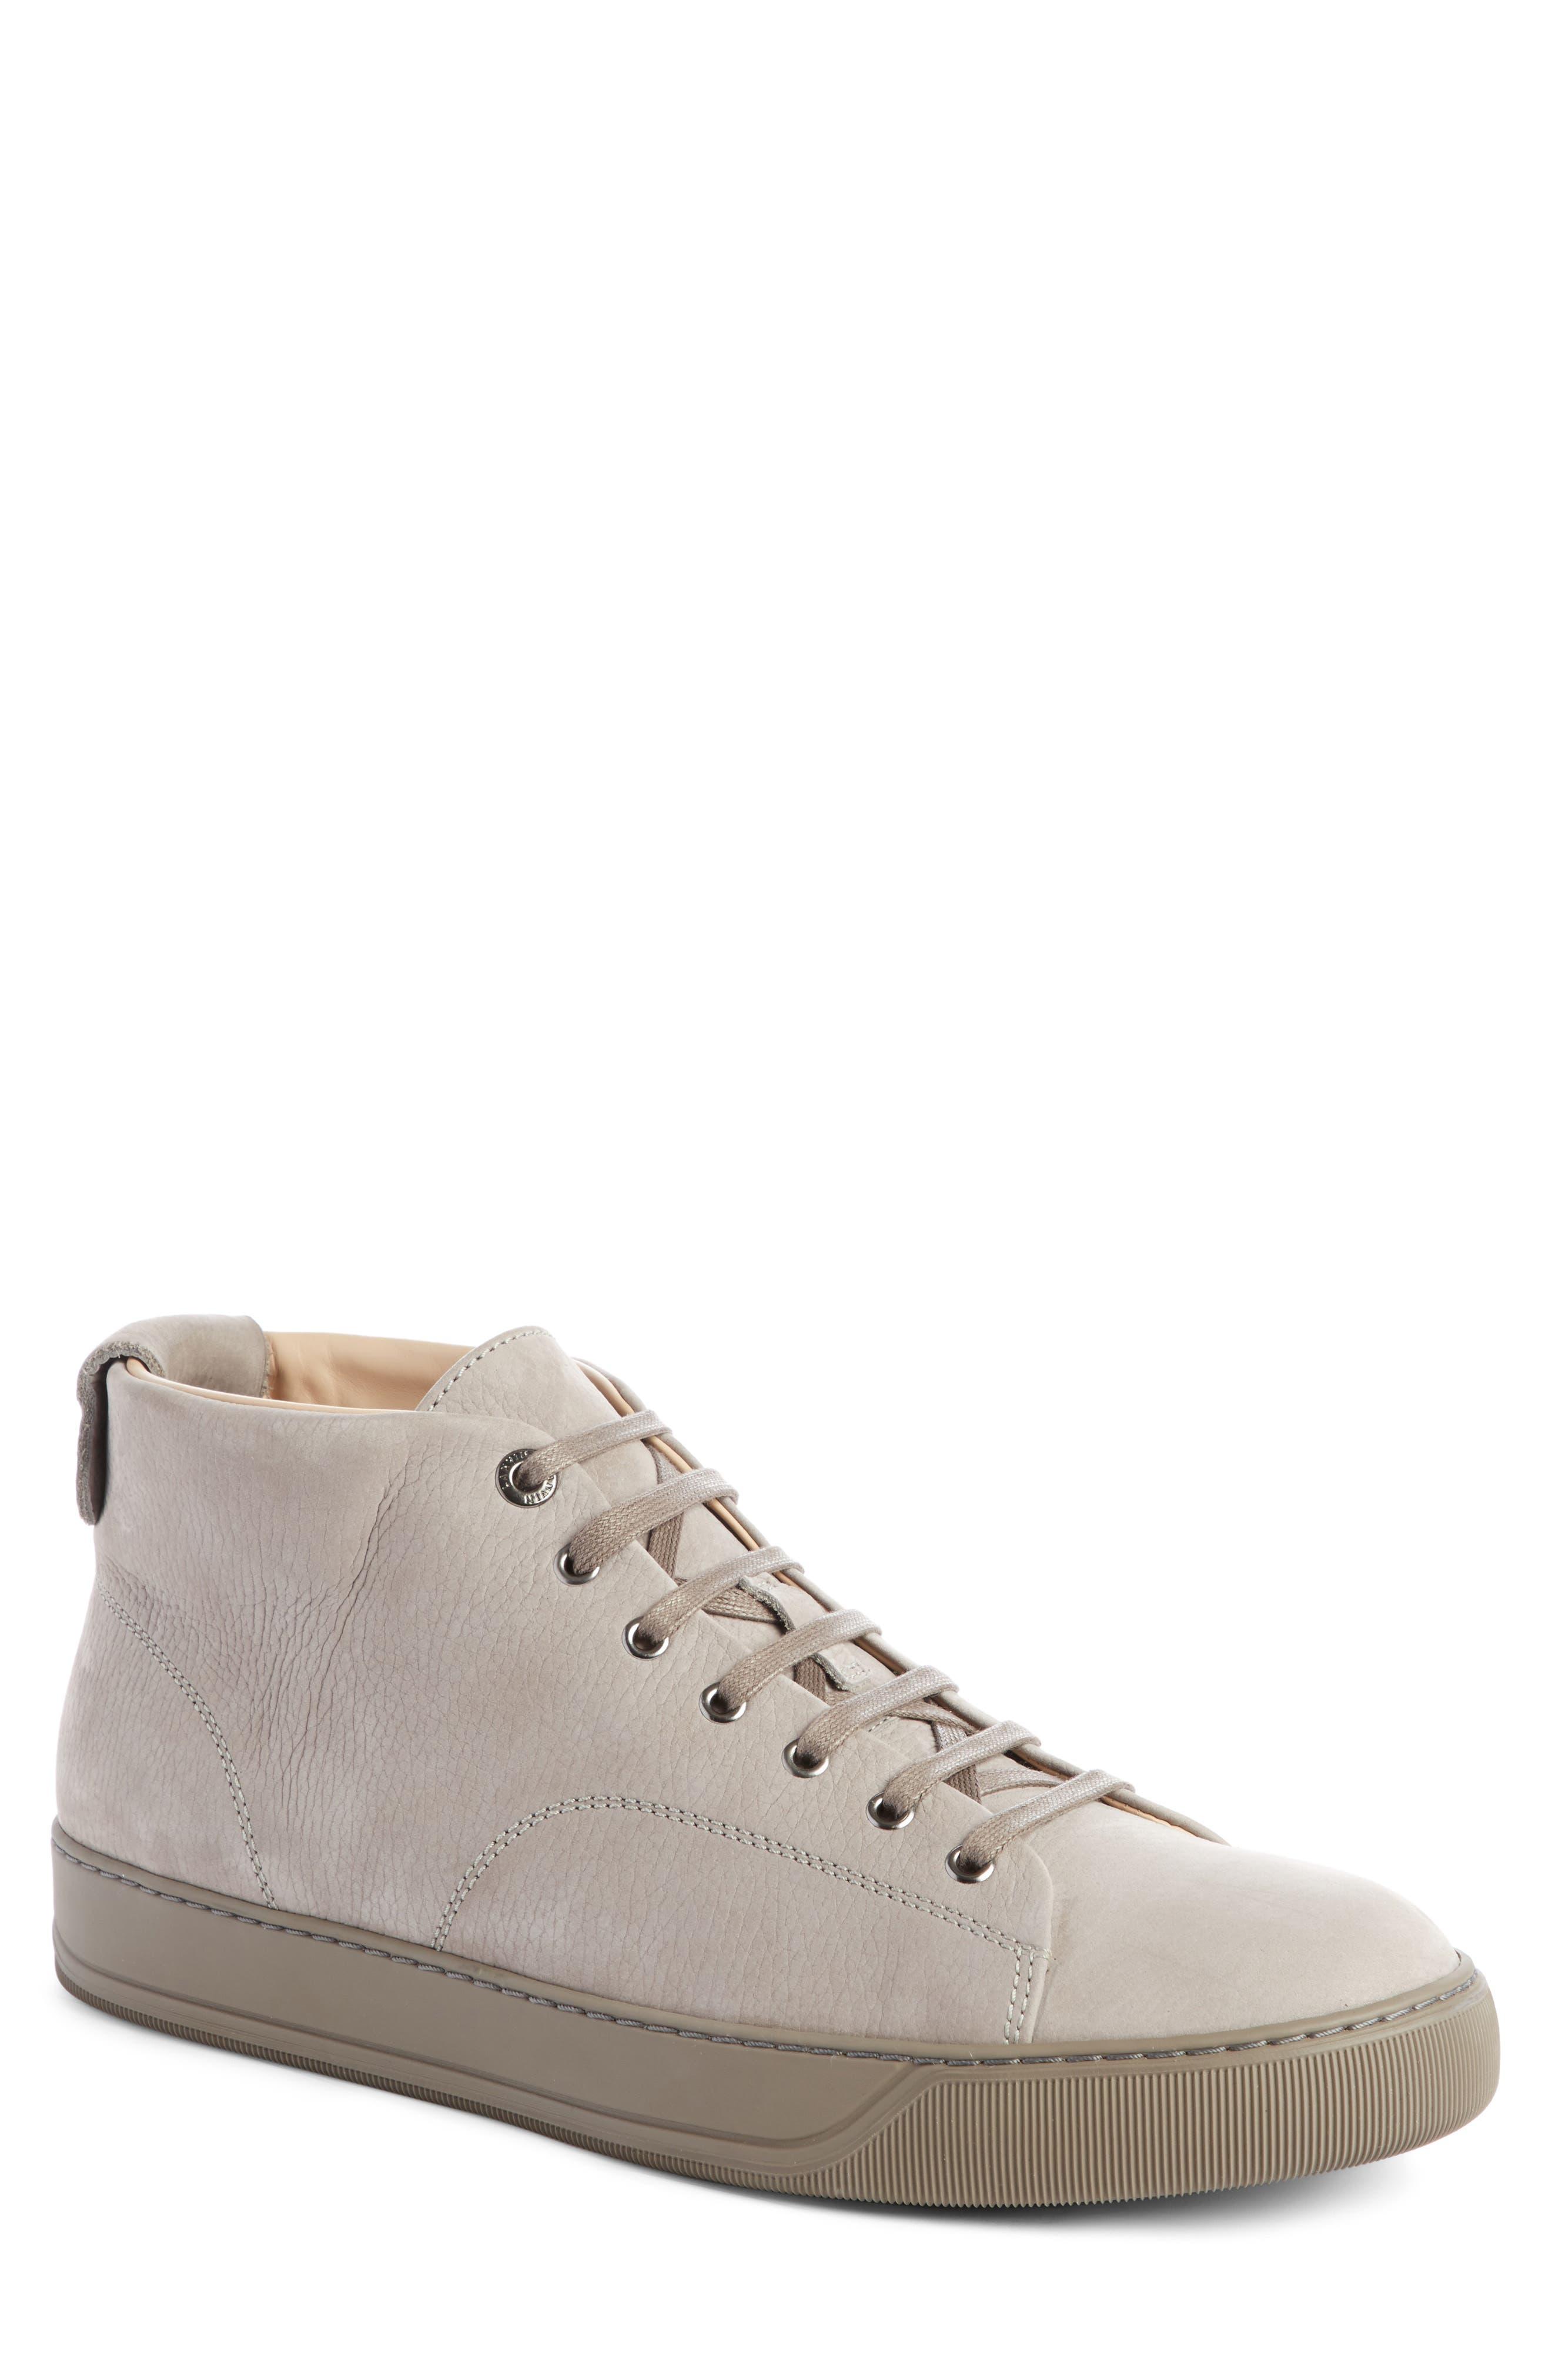 Mid Top Sneaker,                         Main,                         color, Light Grey Suede